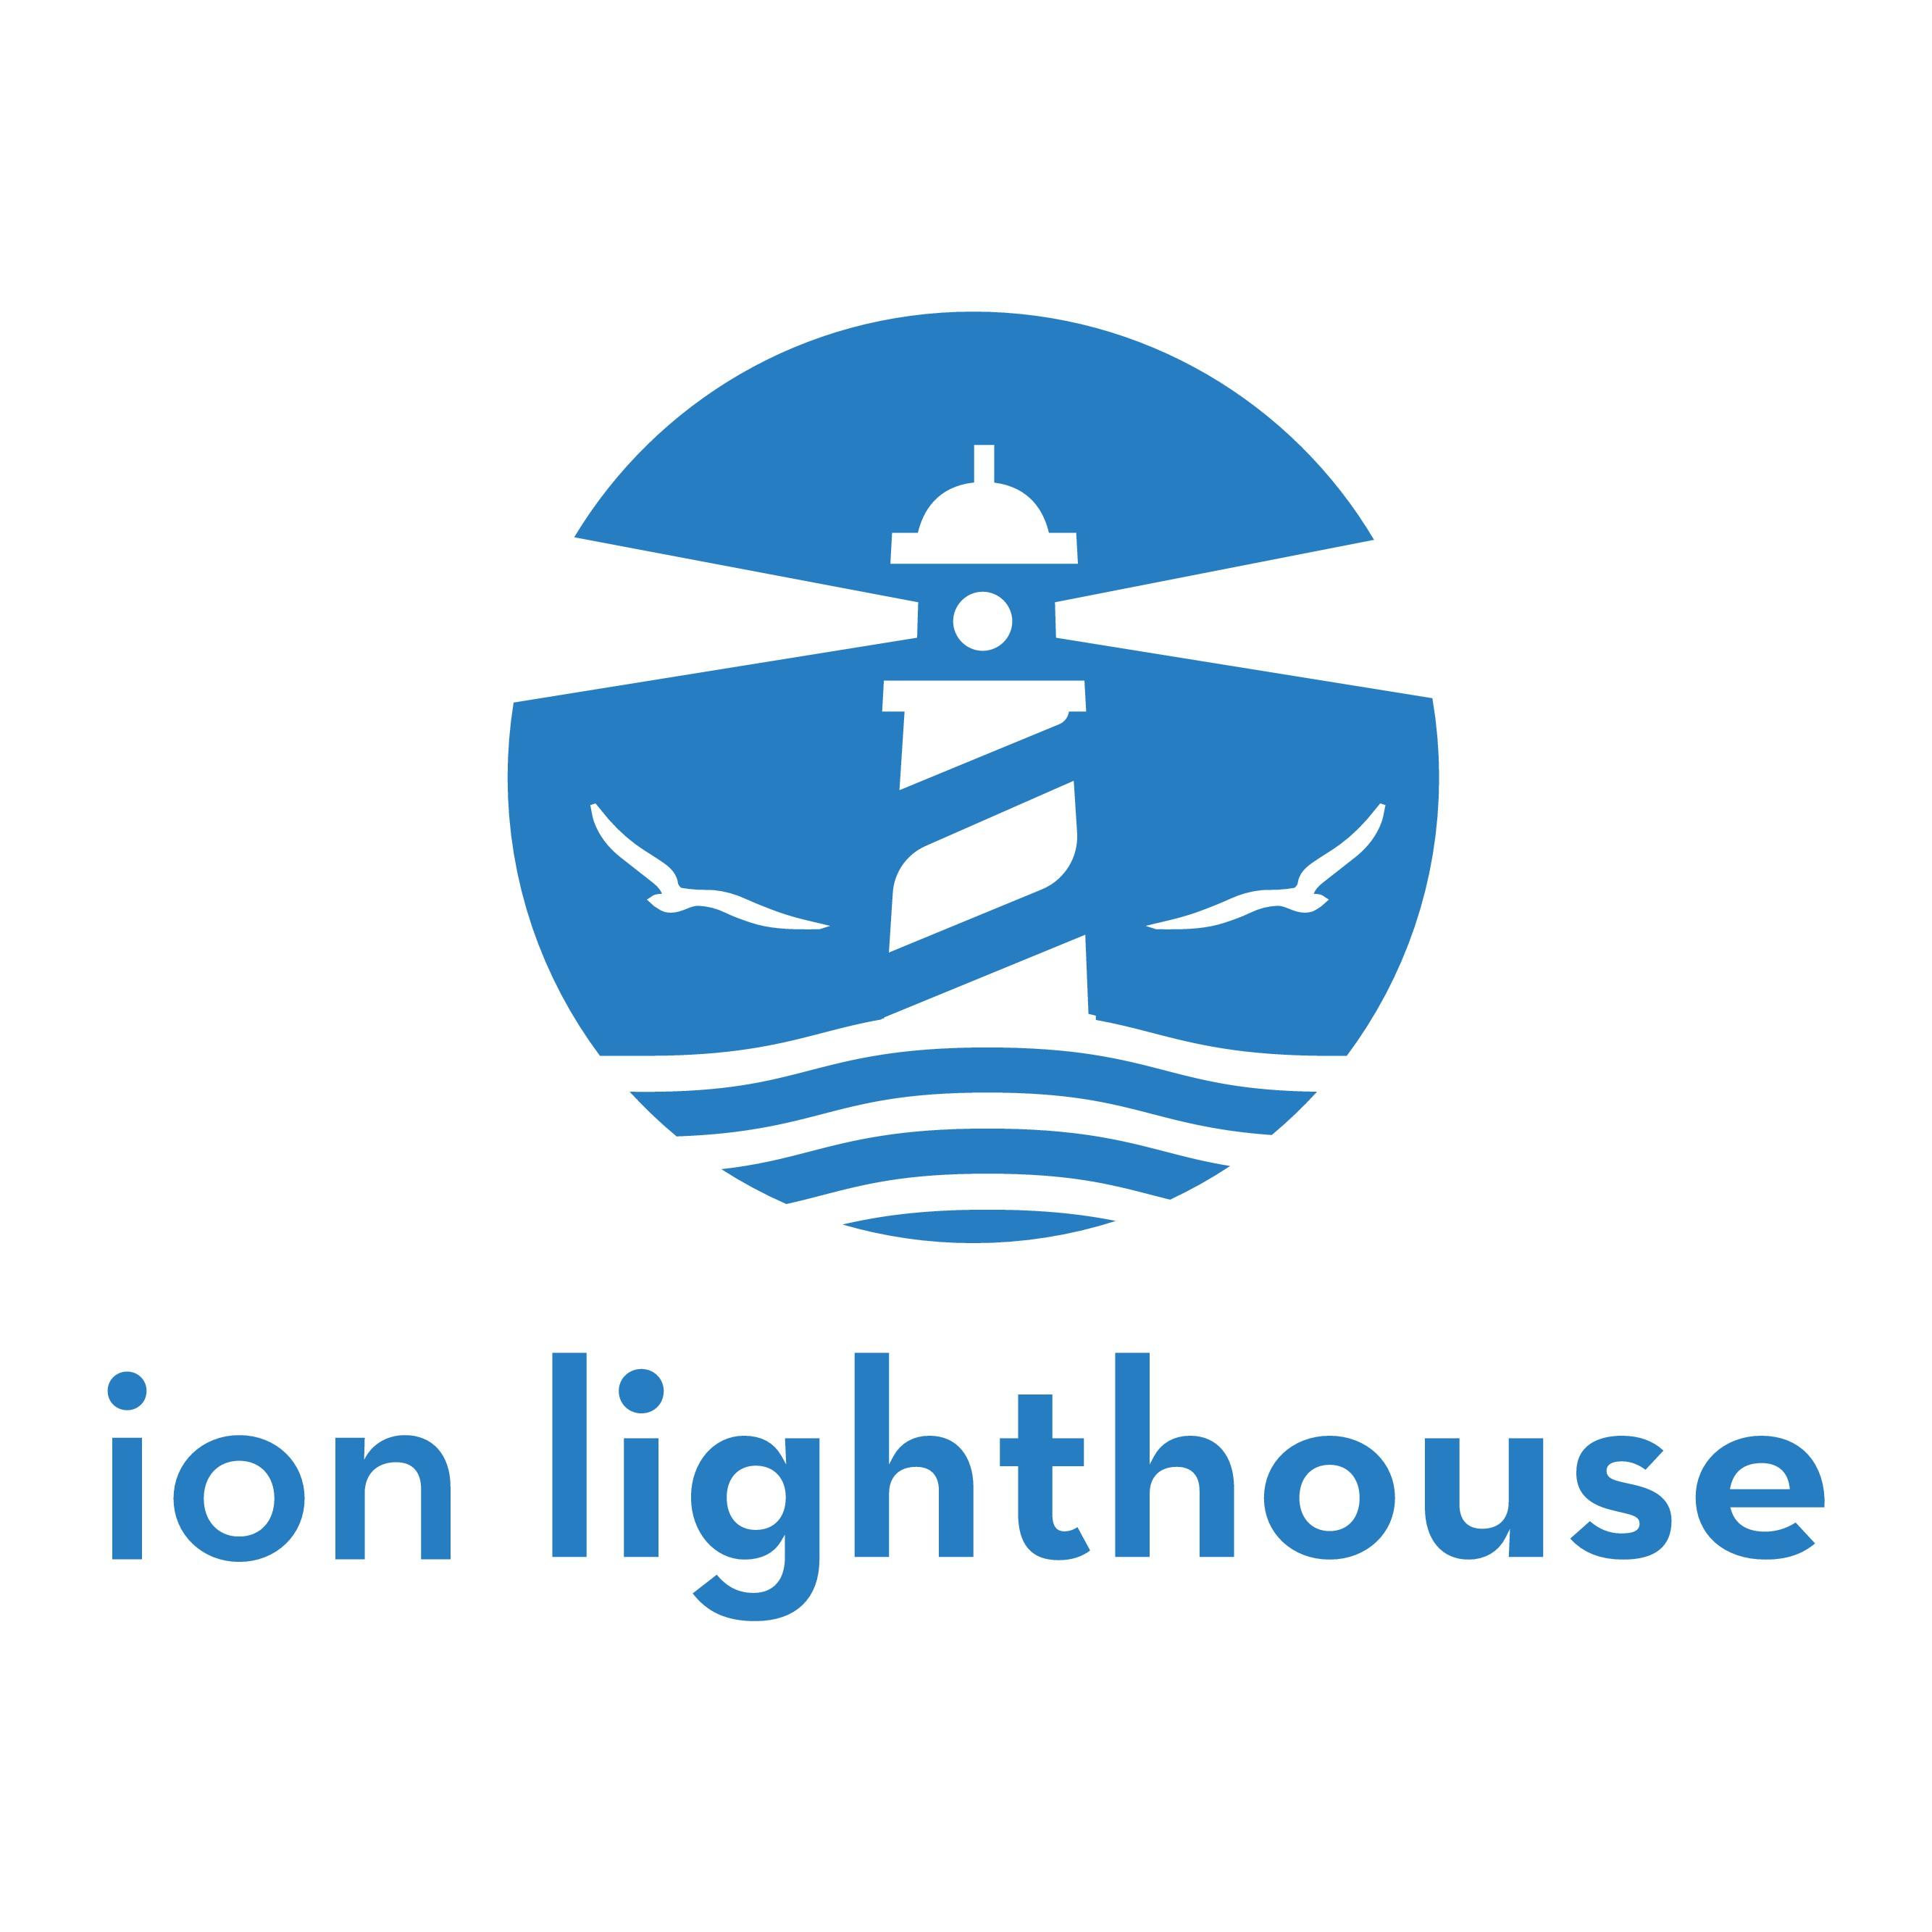 startup logo - lighthouse